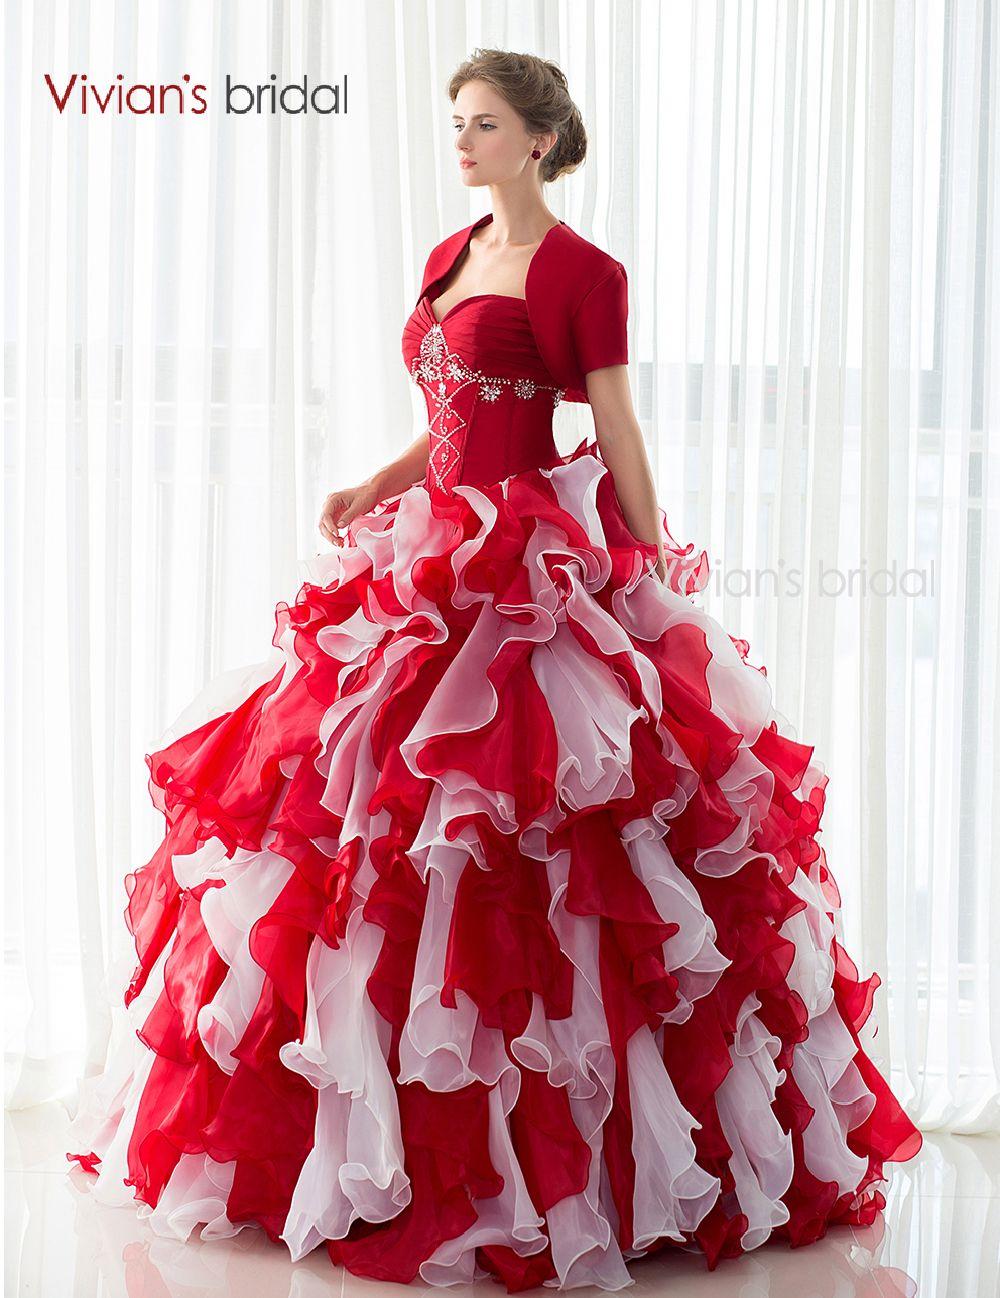 Encantador Vestidos De Fiesta Nanaimo Ilustración - Colección de ...